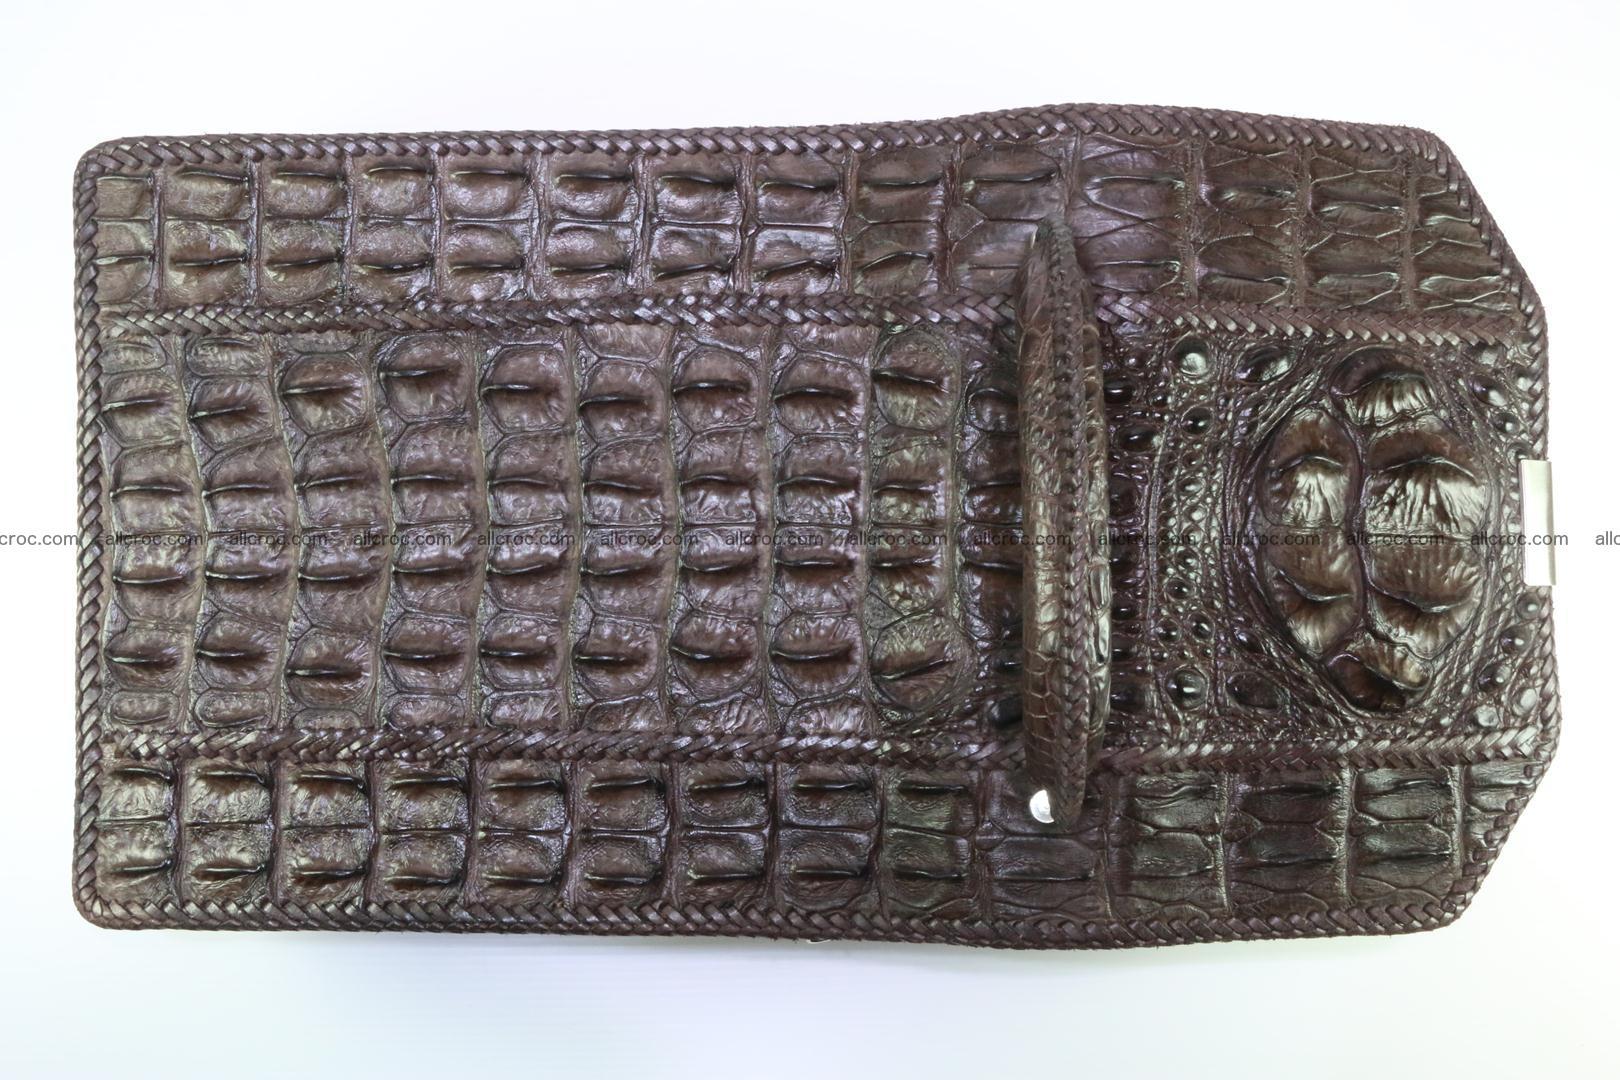 Crocodile skin messenger bag braided edges 138 Foto 8